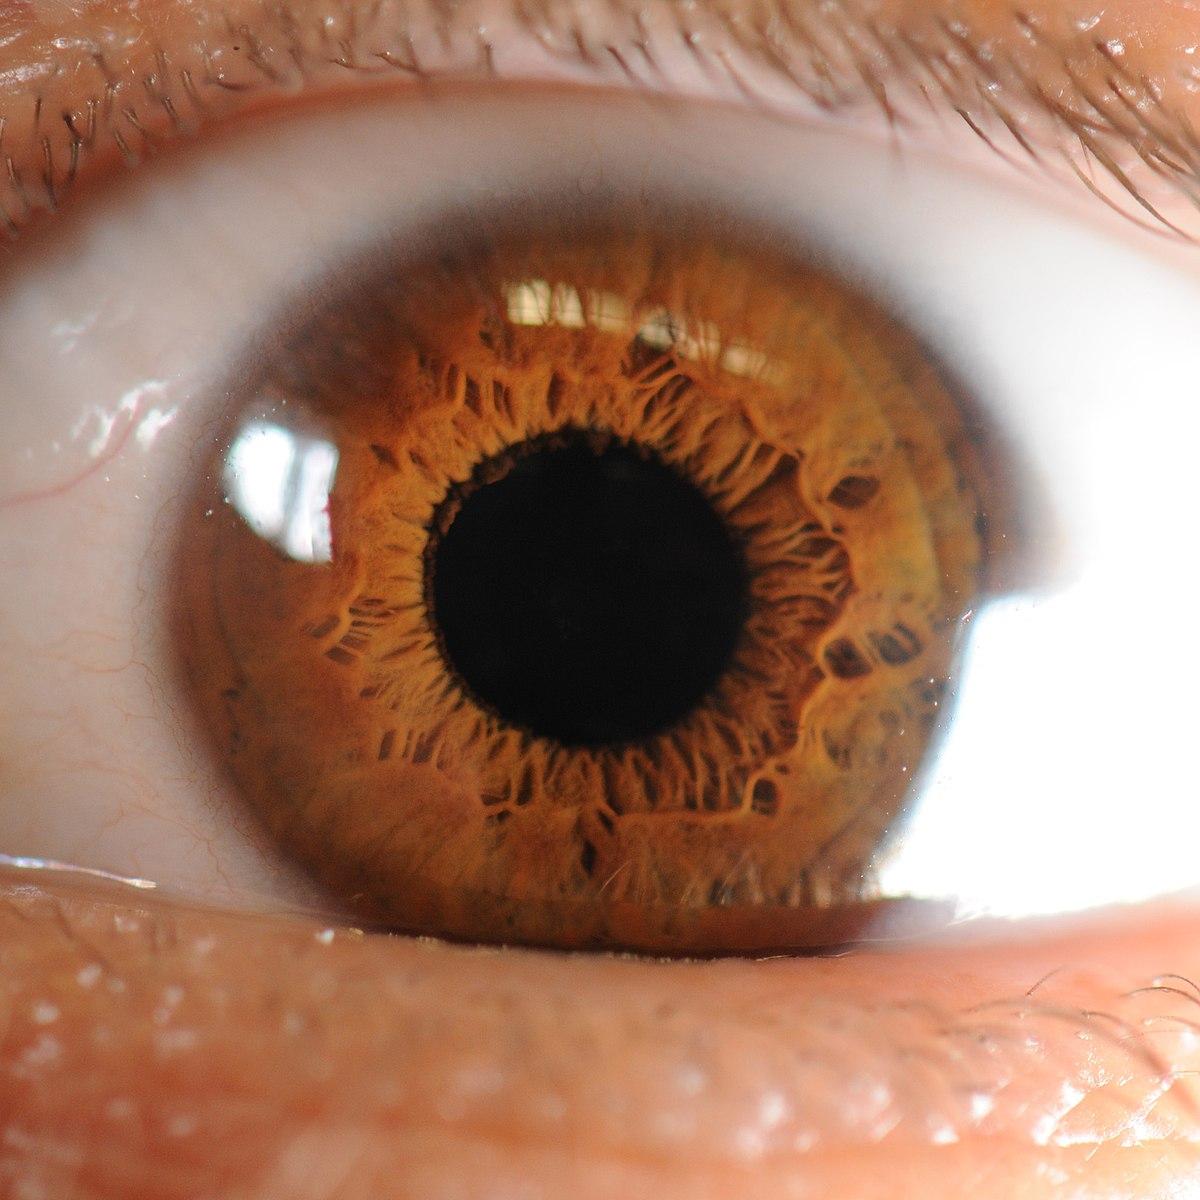 Iris (Auge) – Wikipedia